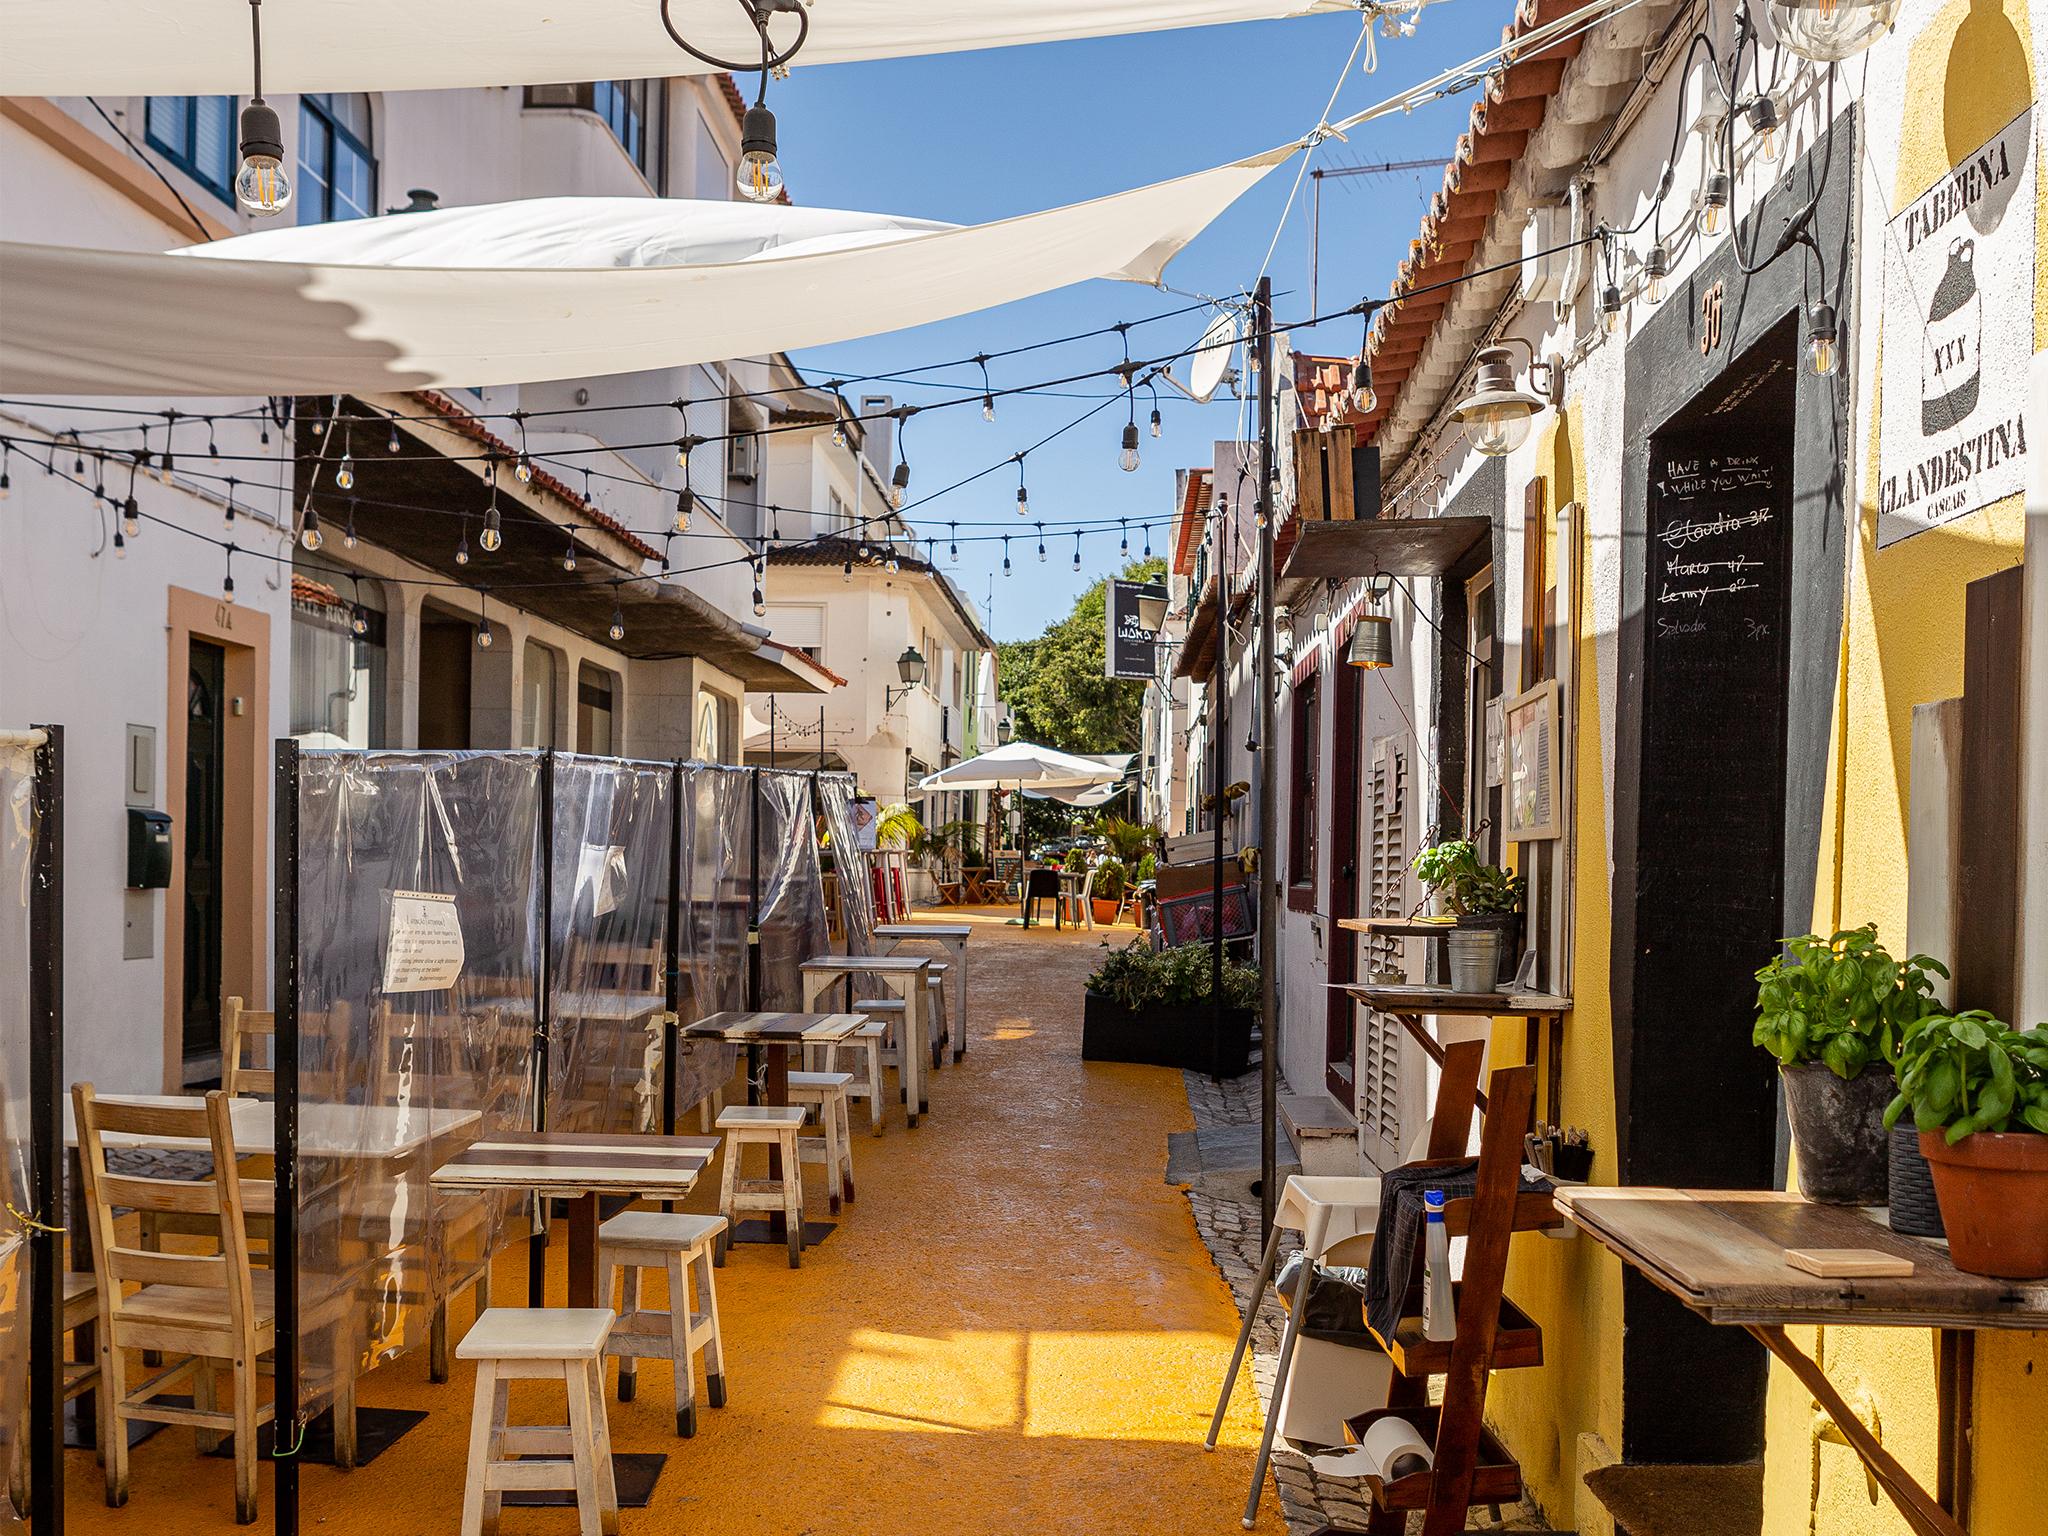 Restaurante, Petisco, Cascais, Taberna Clandestina